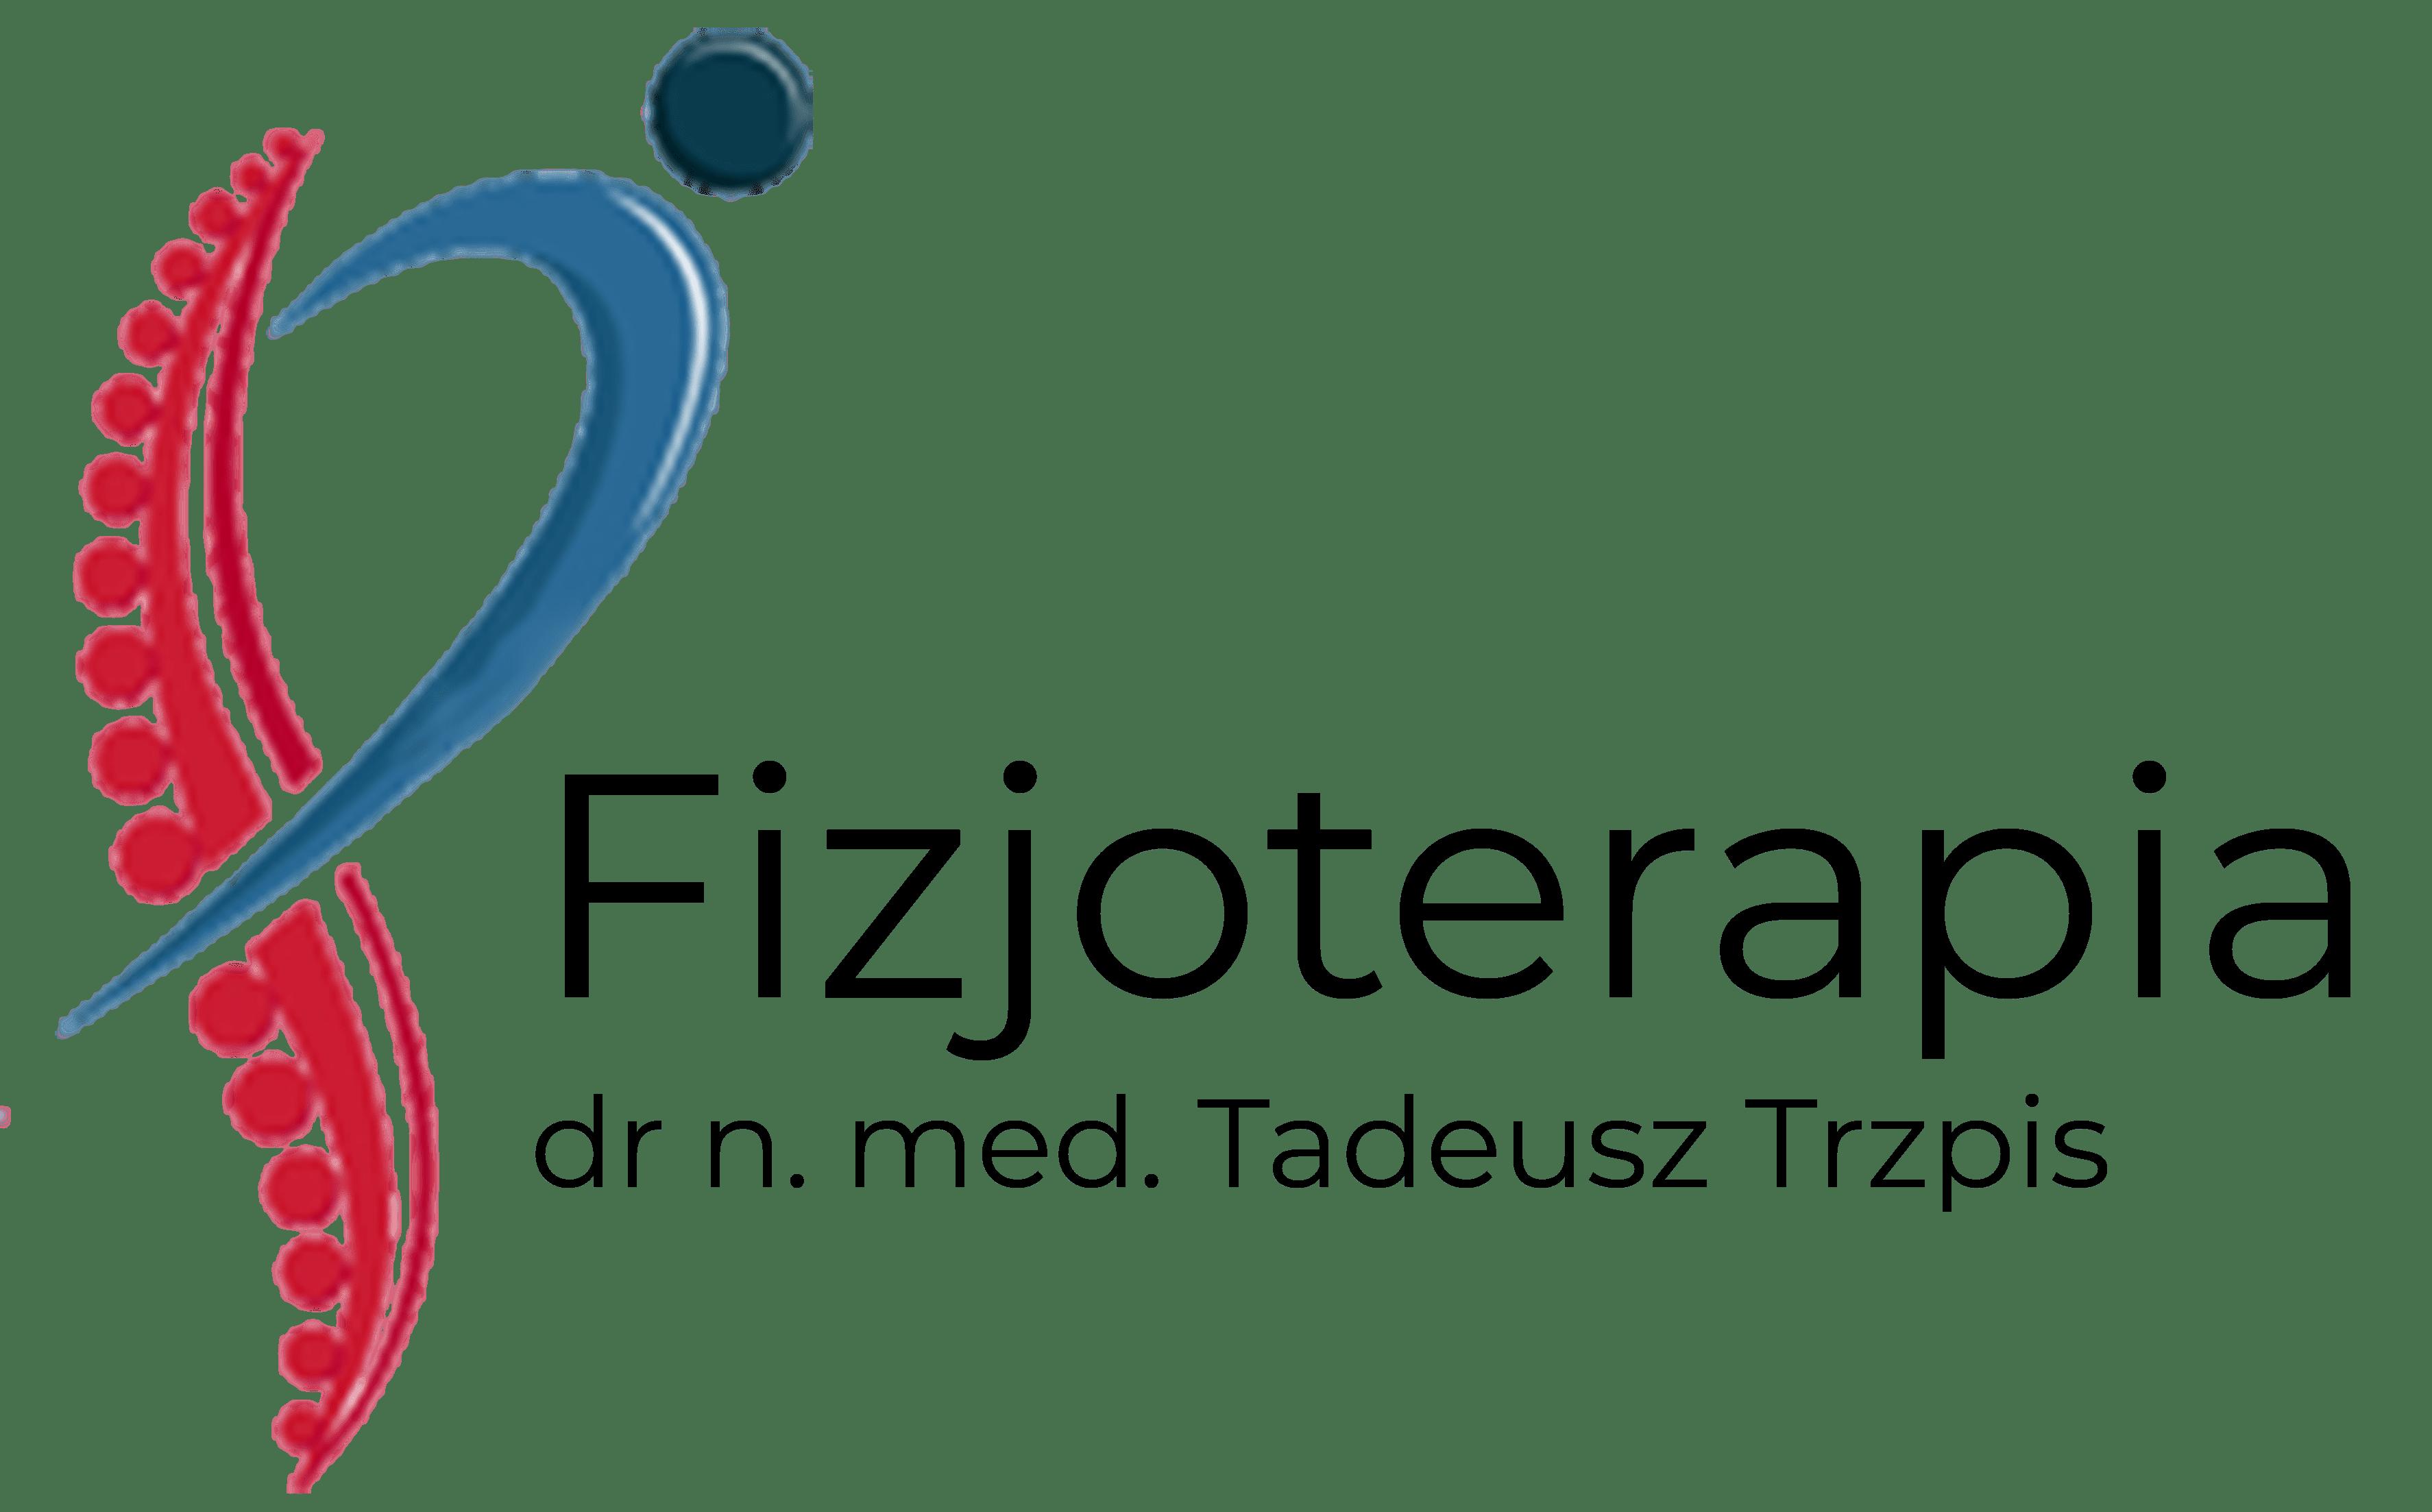 Tedreh Fizjoterapia dr n. med. Tadeusz Trzpis